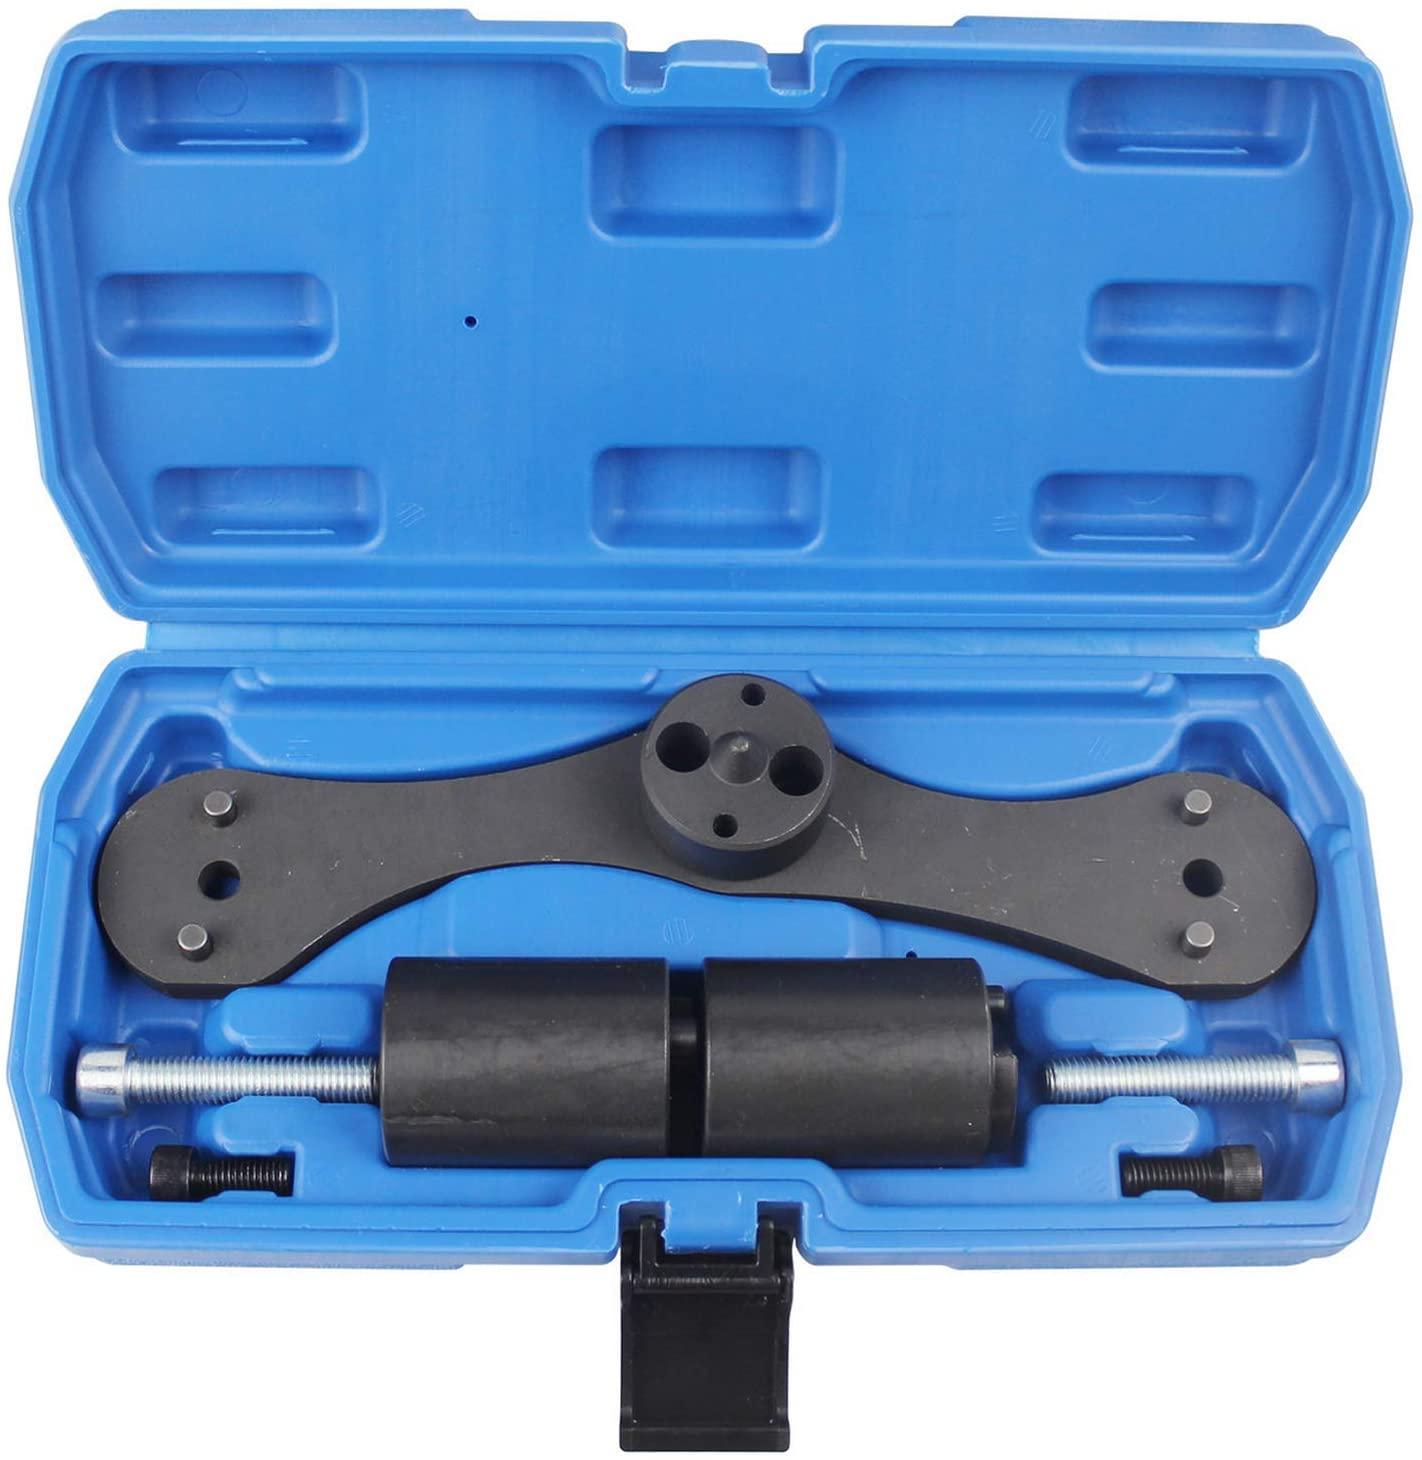 Mrcartool Engine Locking Balance Shaft Alignment Tool Set for BMW B47 B48 N47 X1 X3 X4 X5 Mini